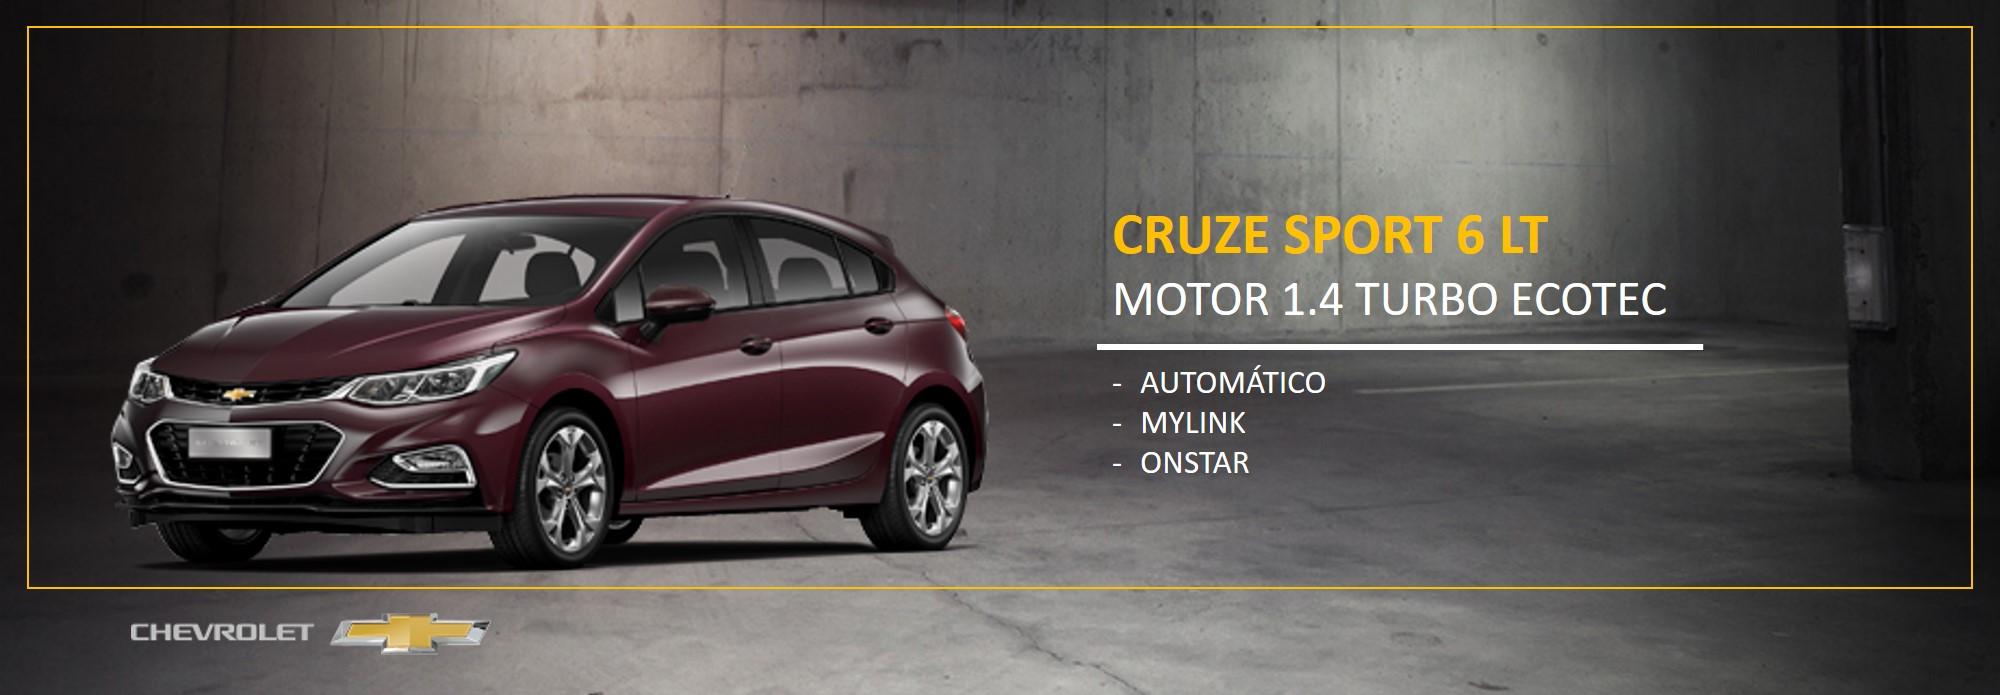 Cruze Sport6 LT 2019